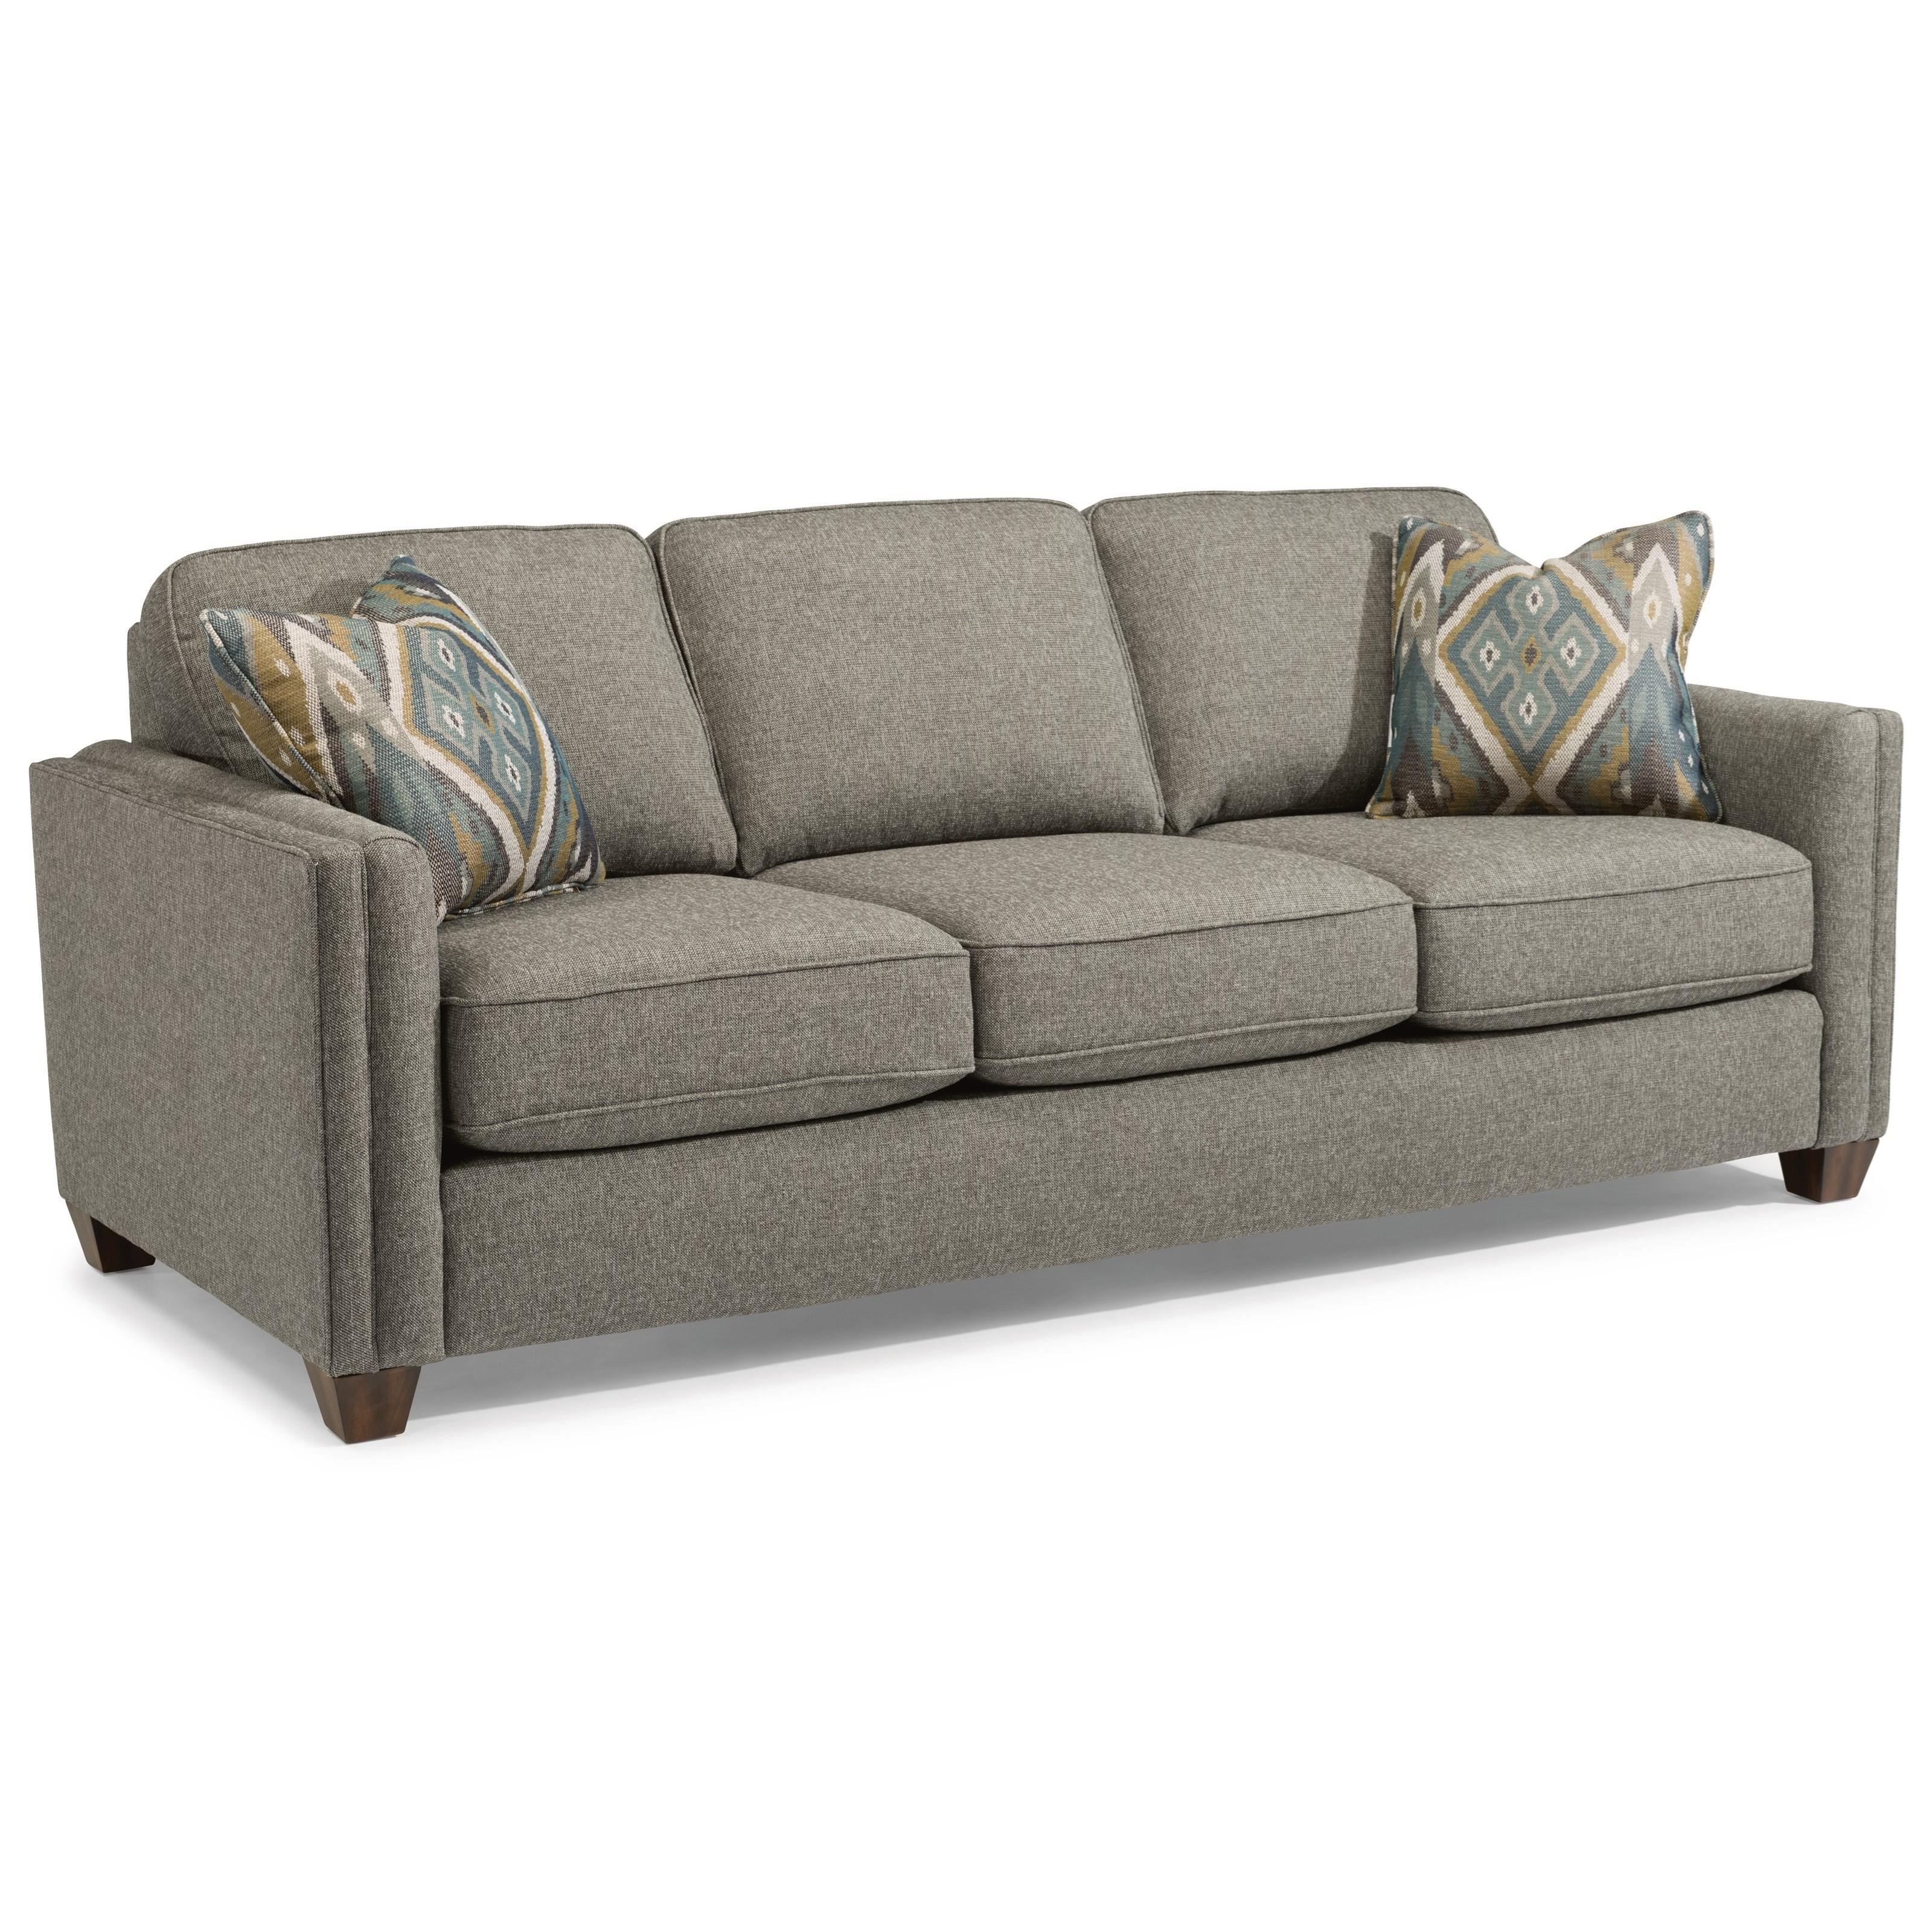 Flexsteel Hyacinth Sofa   Item Number: 5726 31